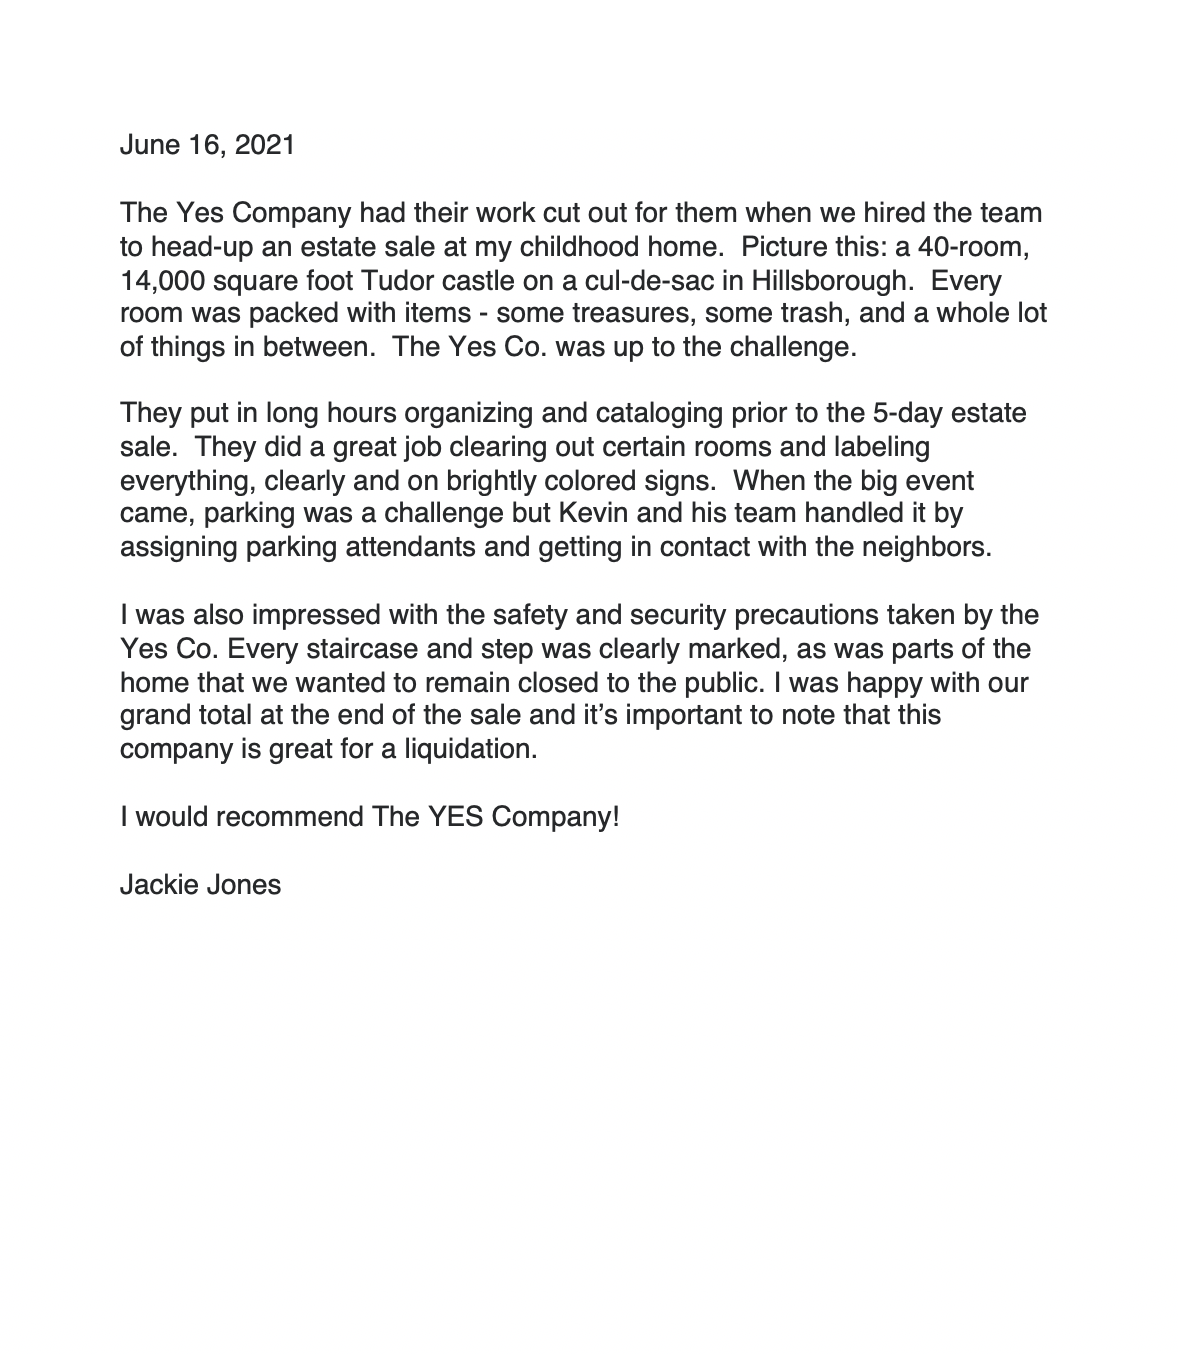 letter_jackie_jones